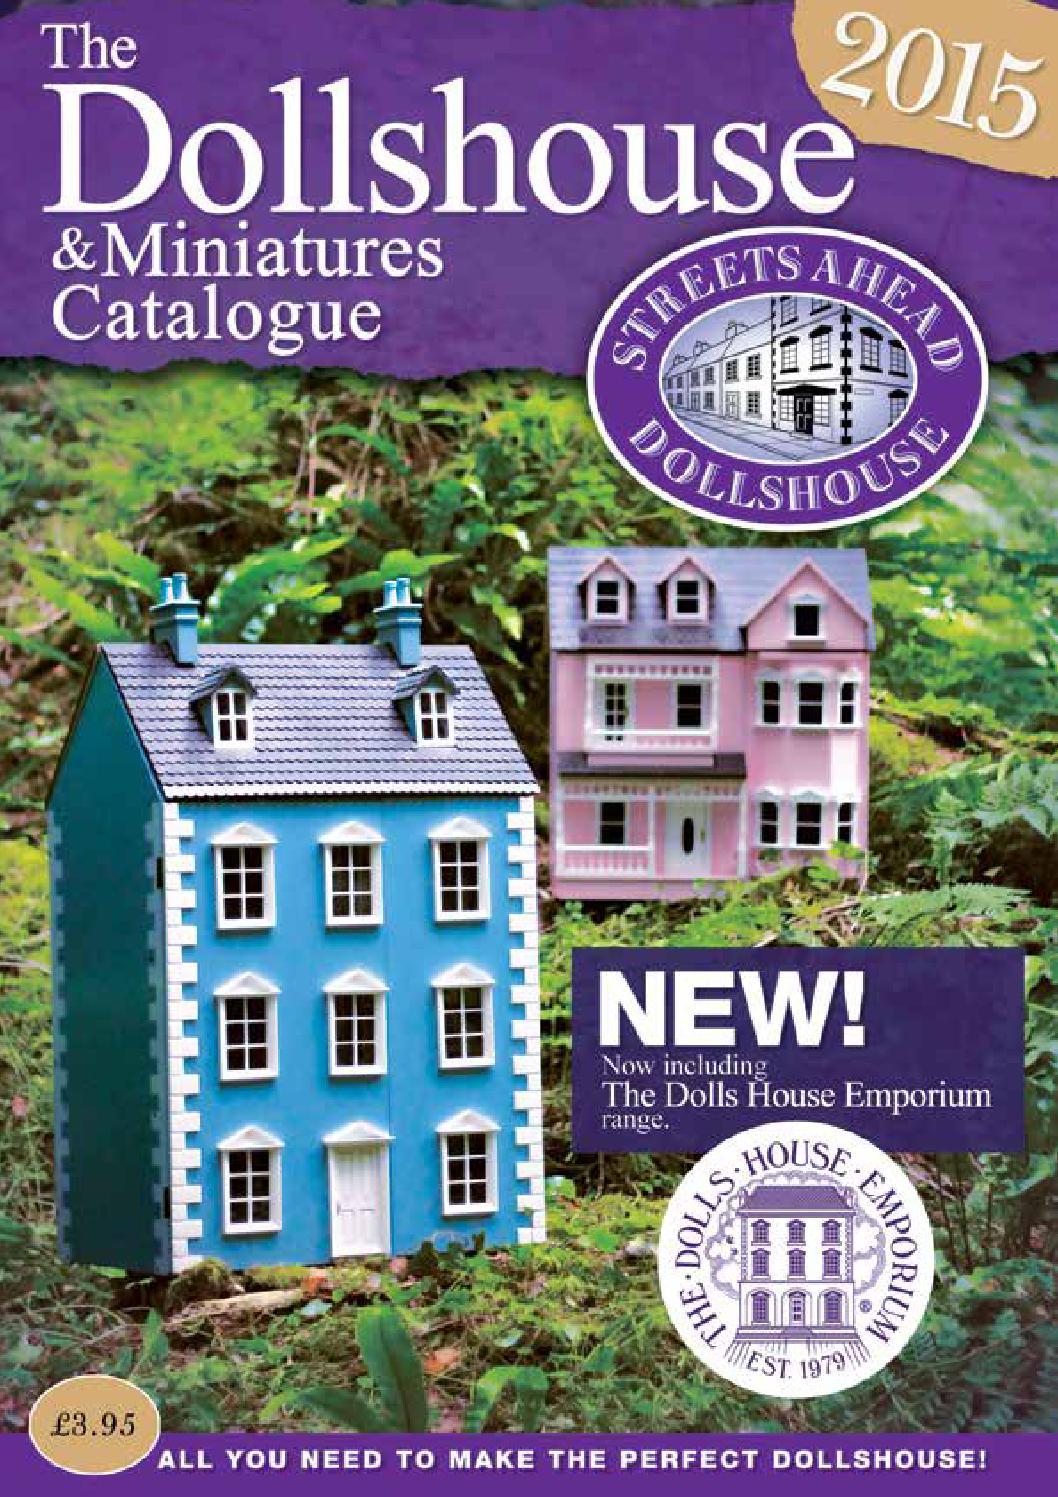 Dolls House Emporium Miniature Pack of 5 Assorted Sea Shells 5525